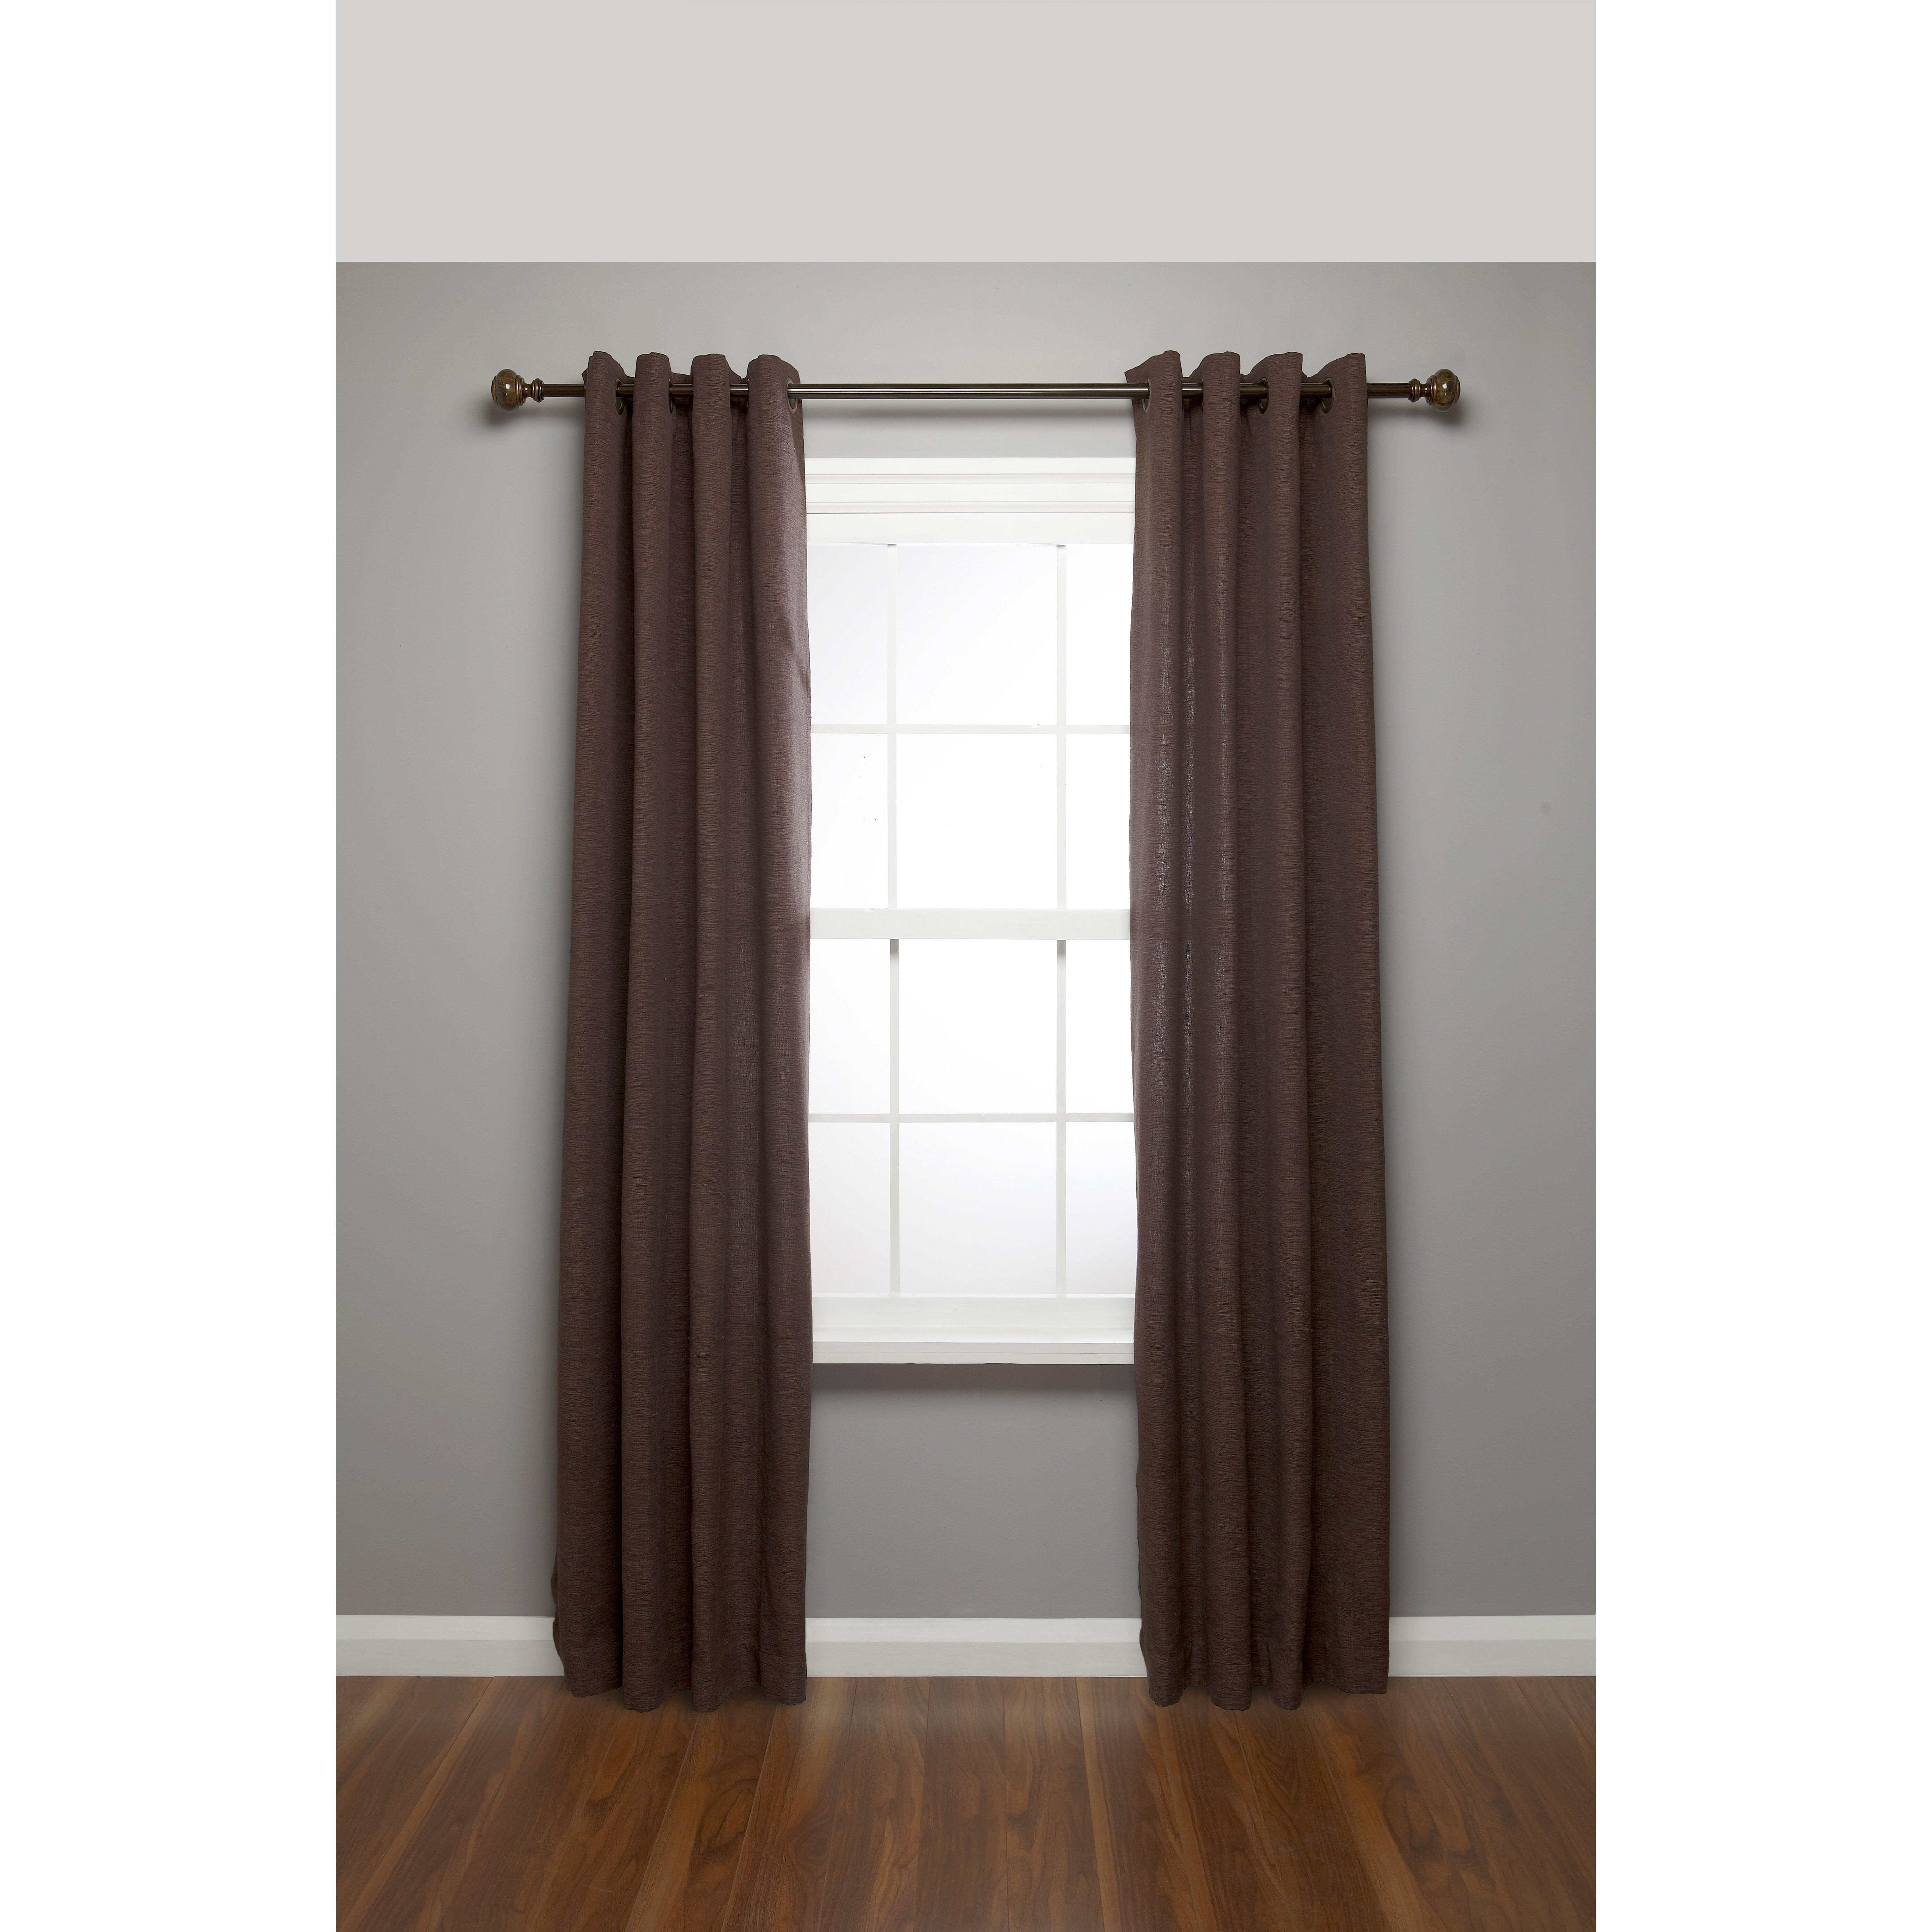 Umbra Marble Finial Drapery Curtain Single Rod Amp Reviews